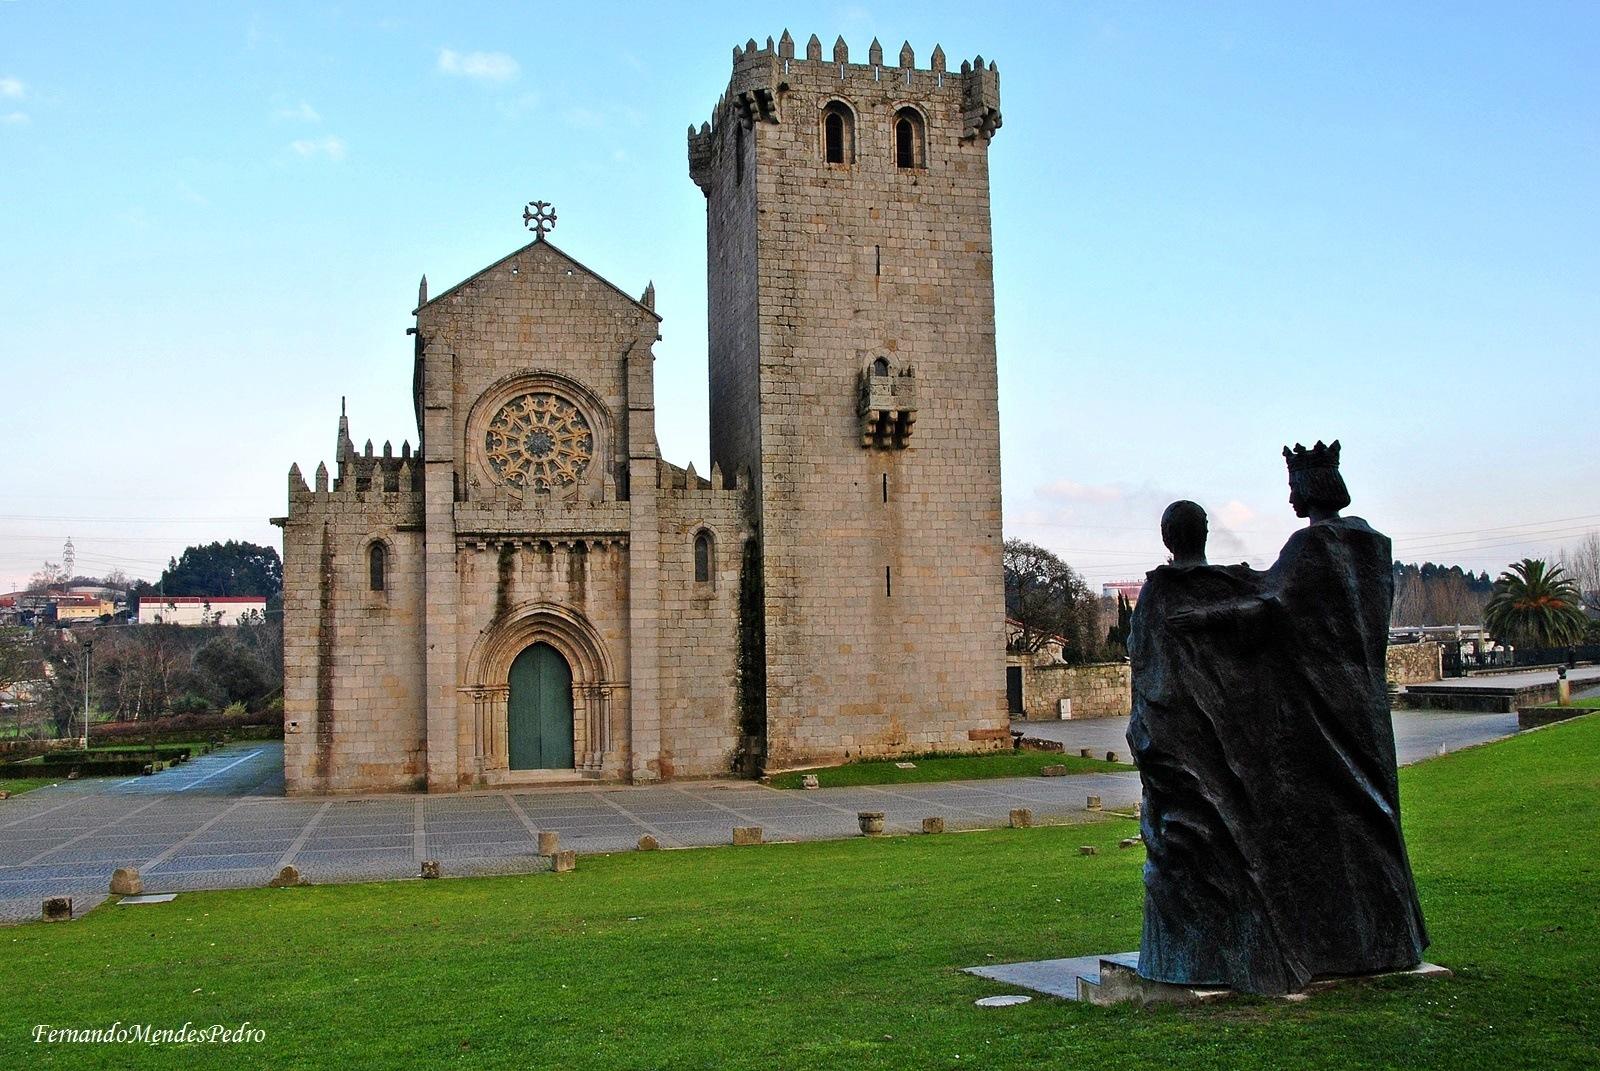 Monastery of LEÇA DO BALIO by FernandoPedro